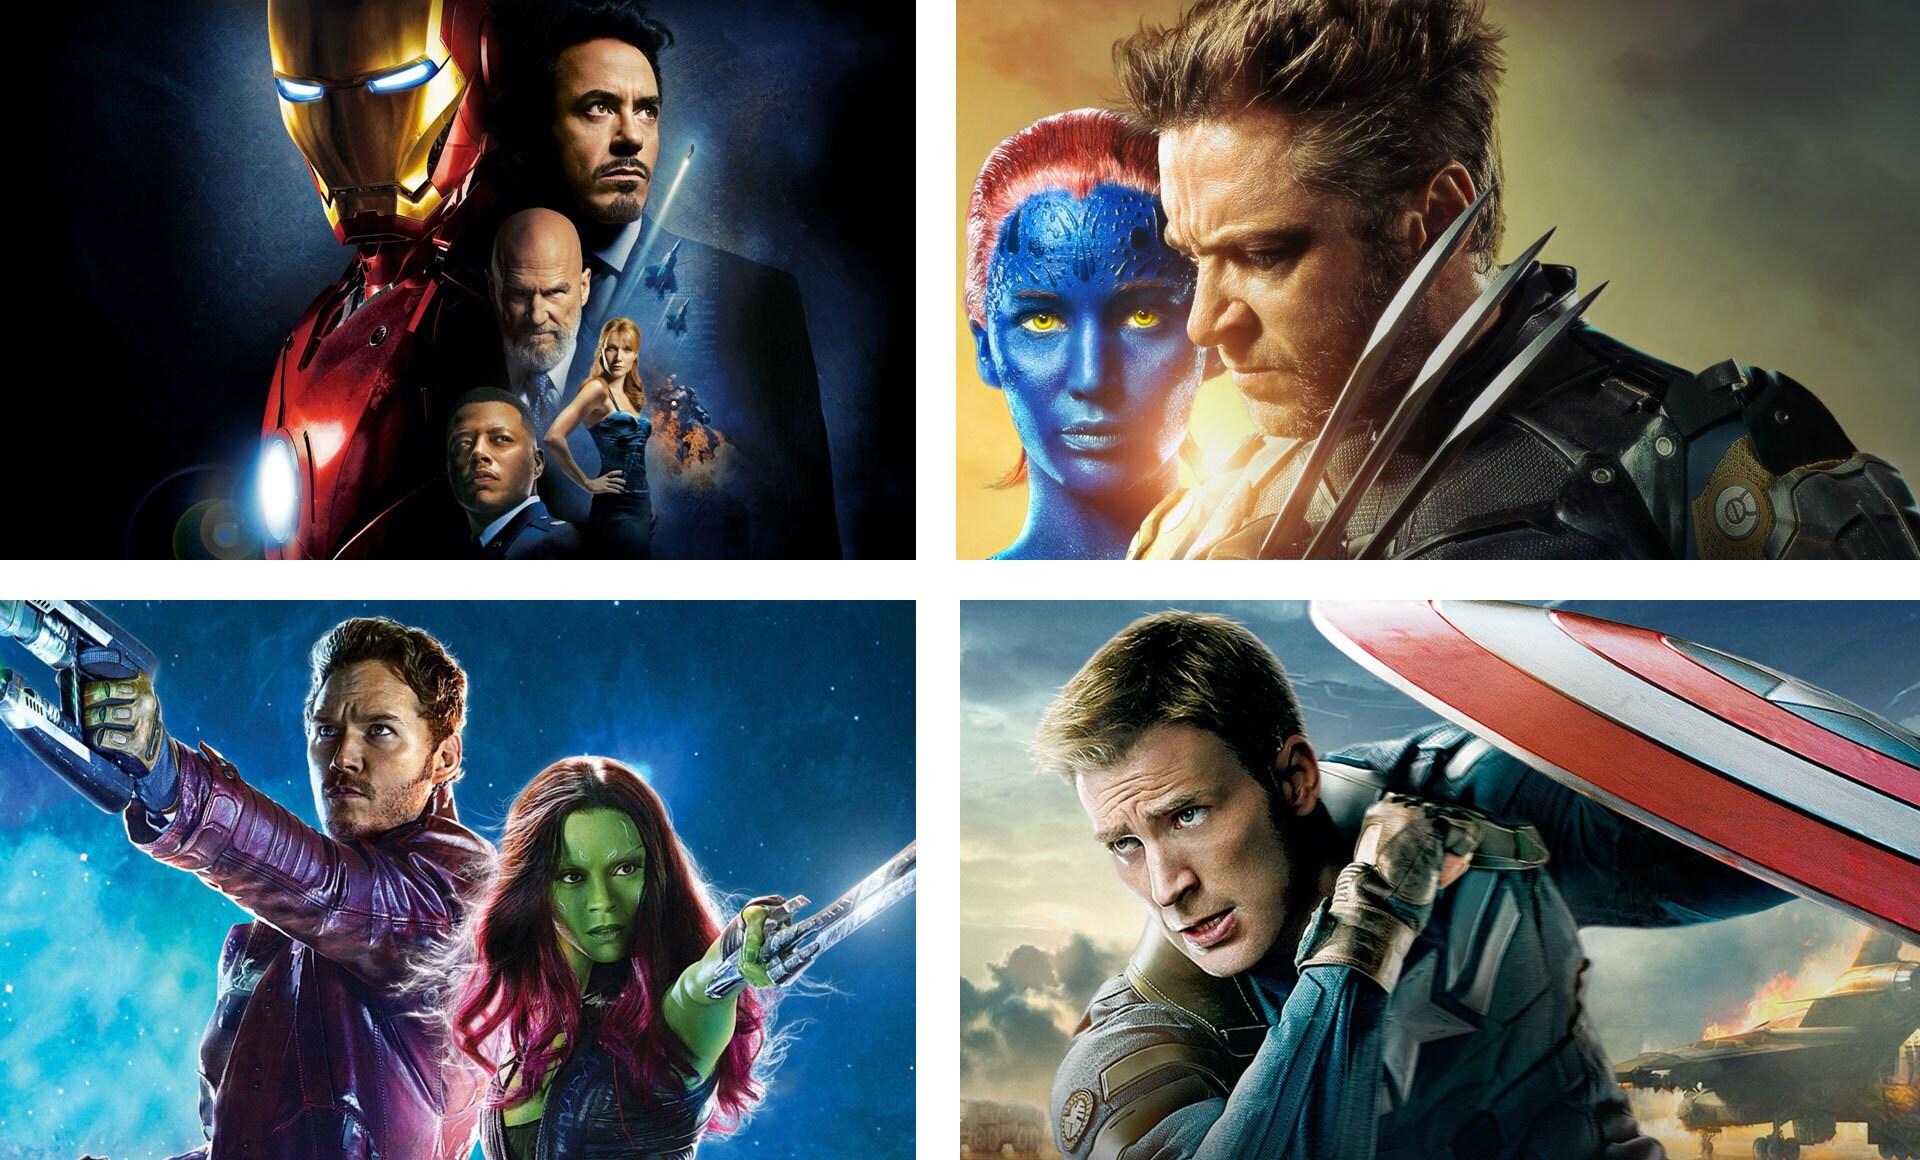 Fermi immagine da vari film Marvel